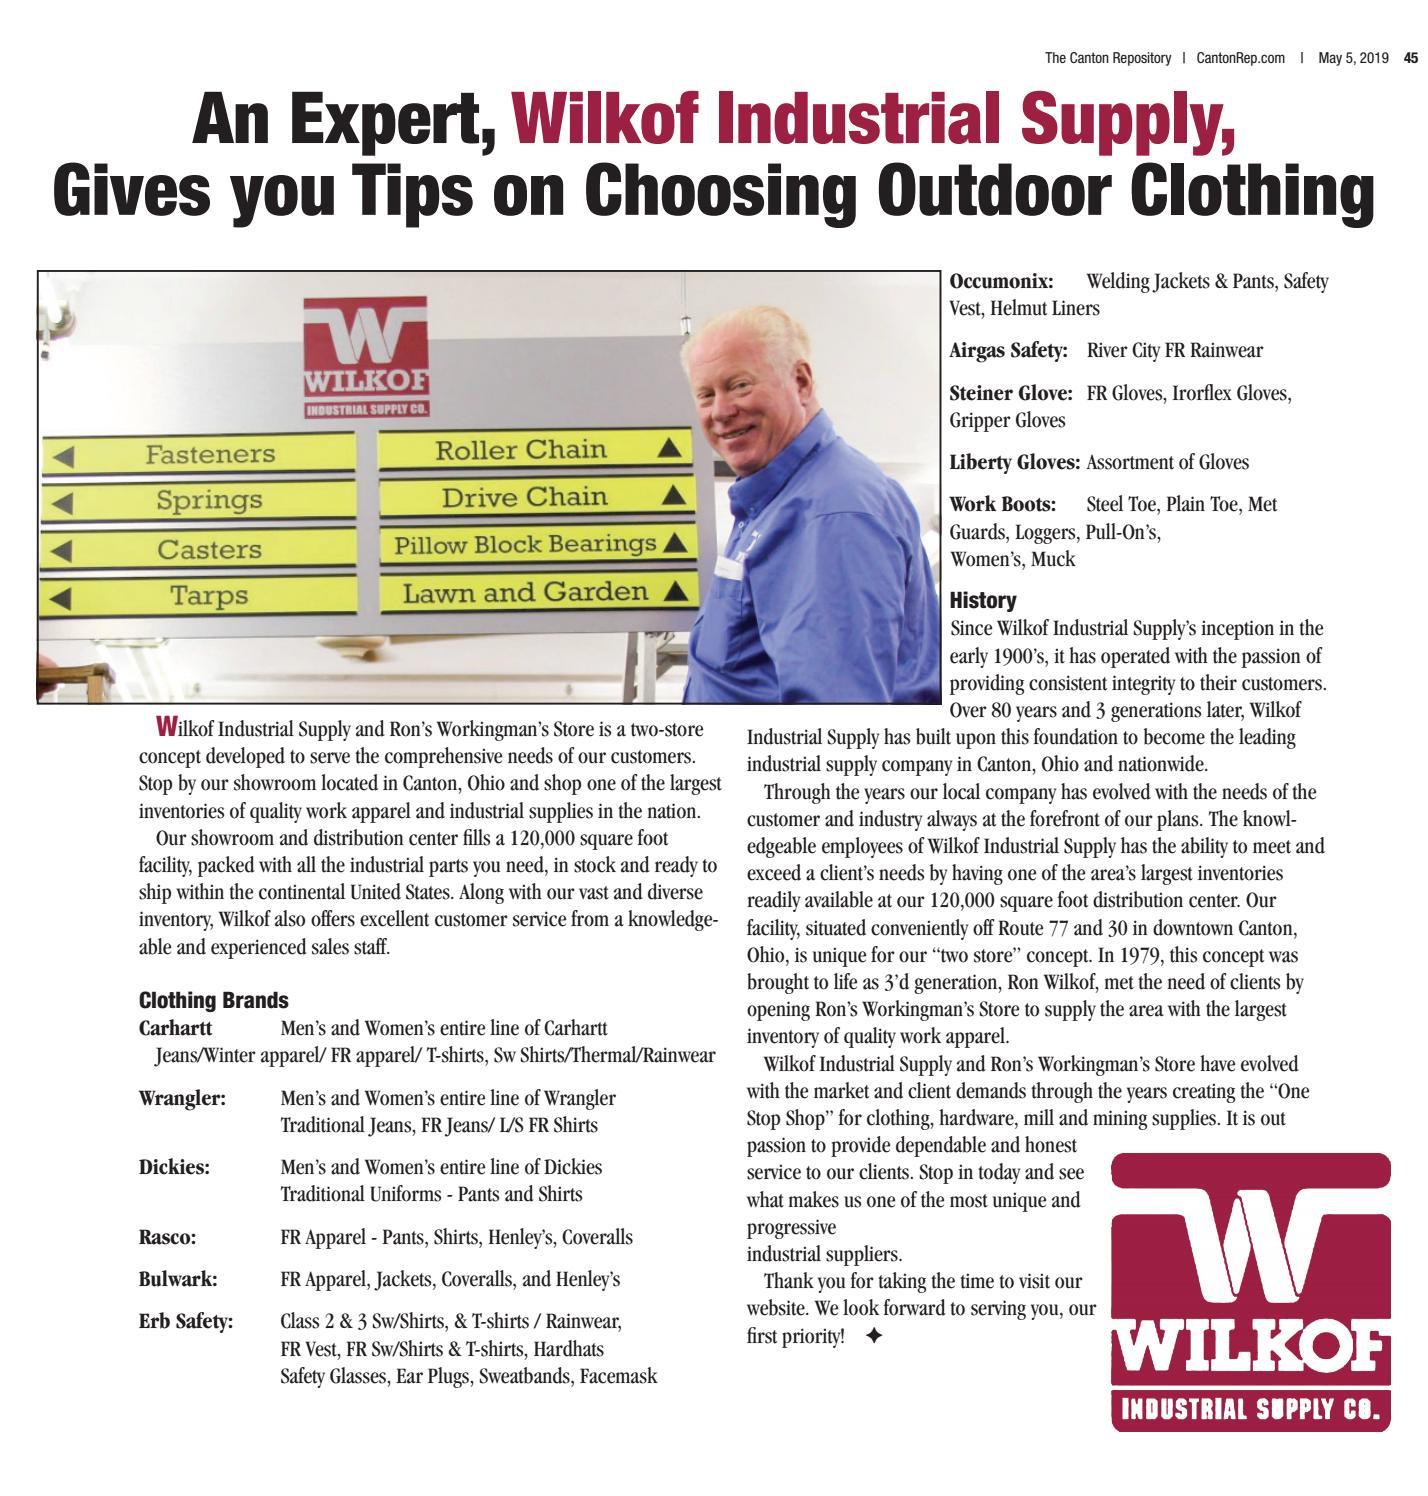 Wilkof Industrial Supply by CantonRepository - issuu